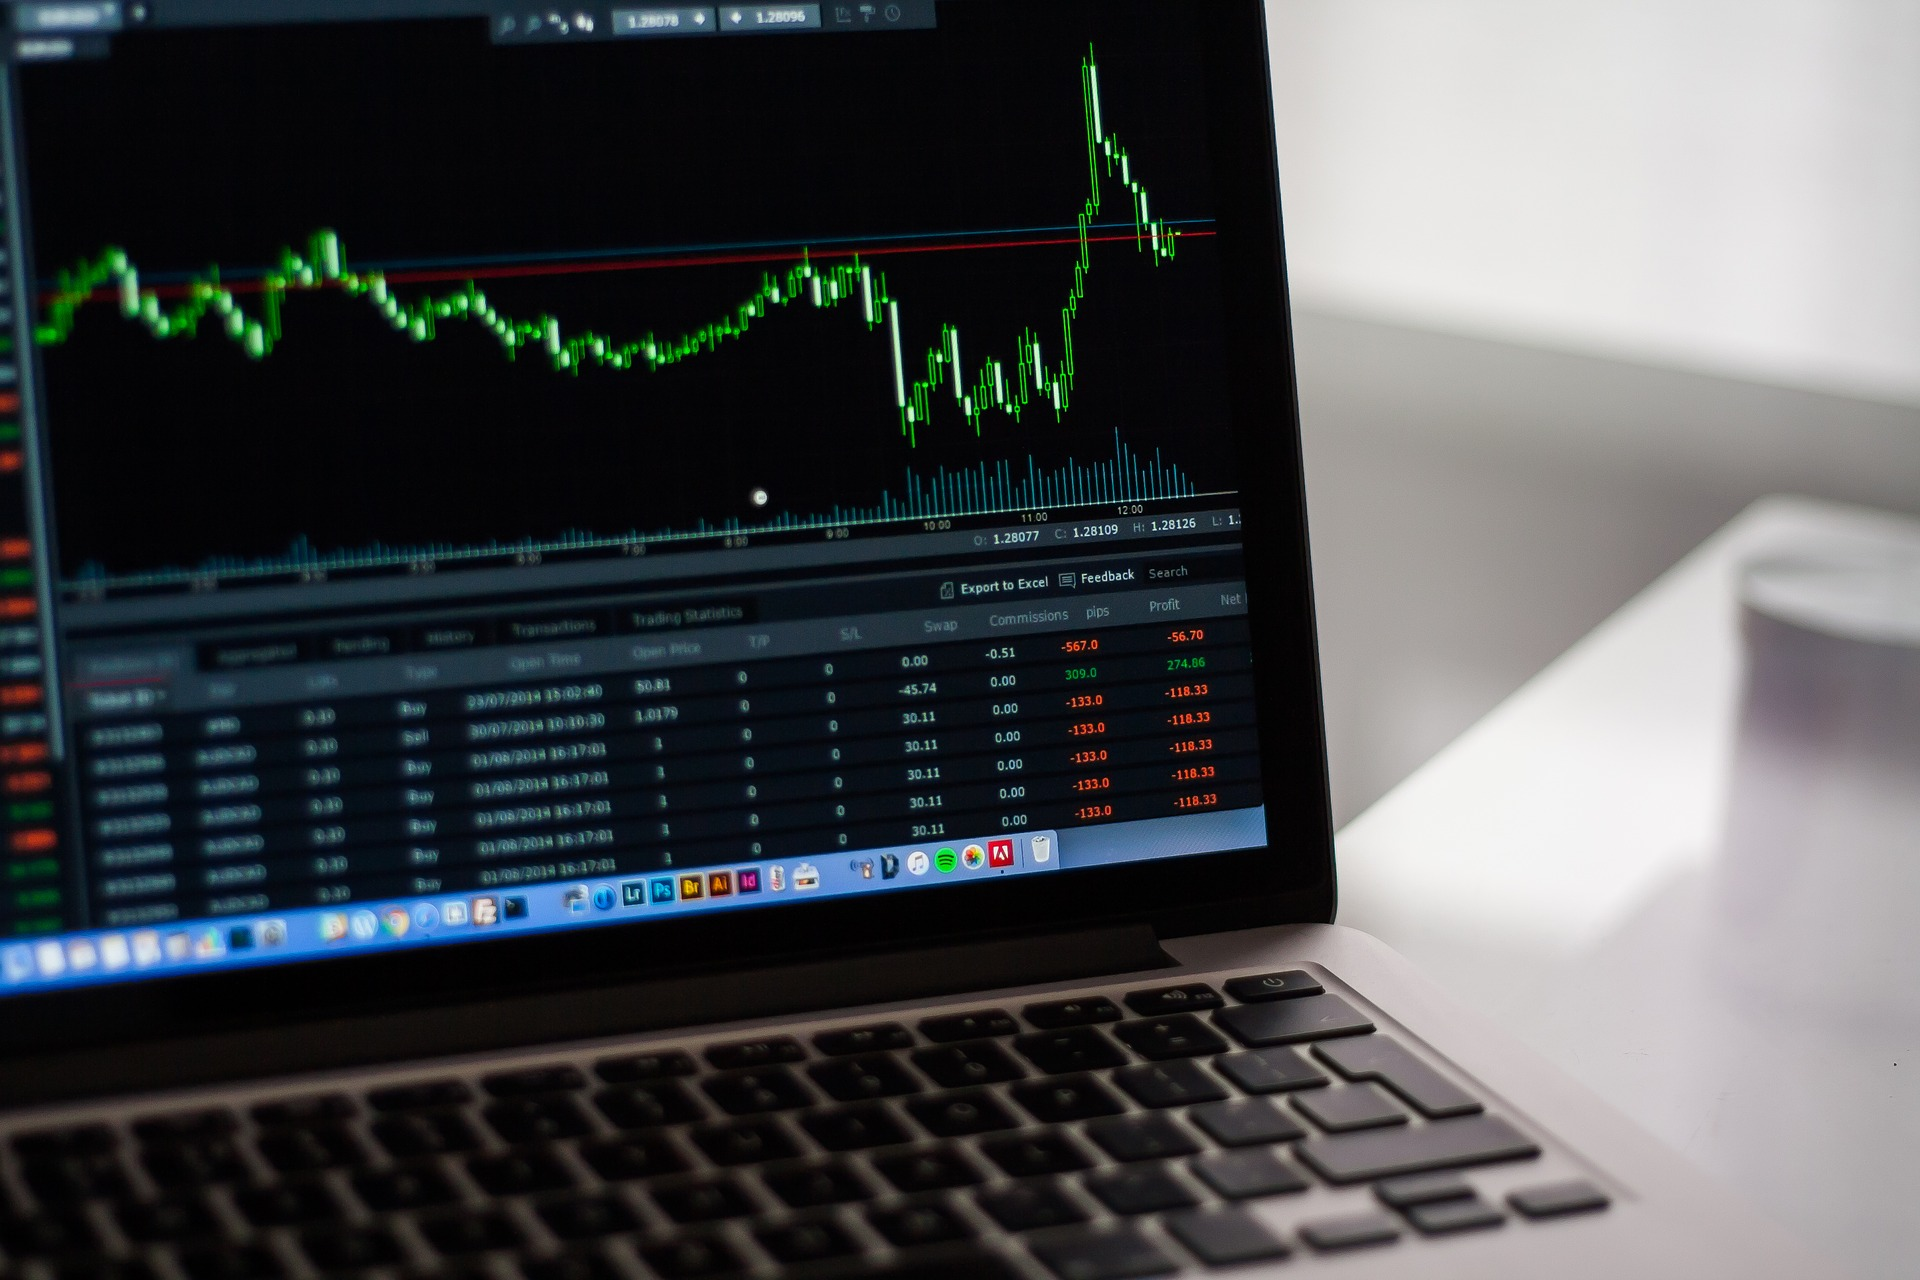 【SBI証券】SBI証券で始まった新たなサービス「米国株式・ETF定期買付サービス」が予想以上に使い易いので紹介します